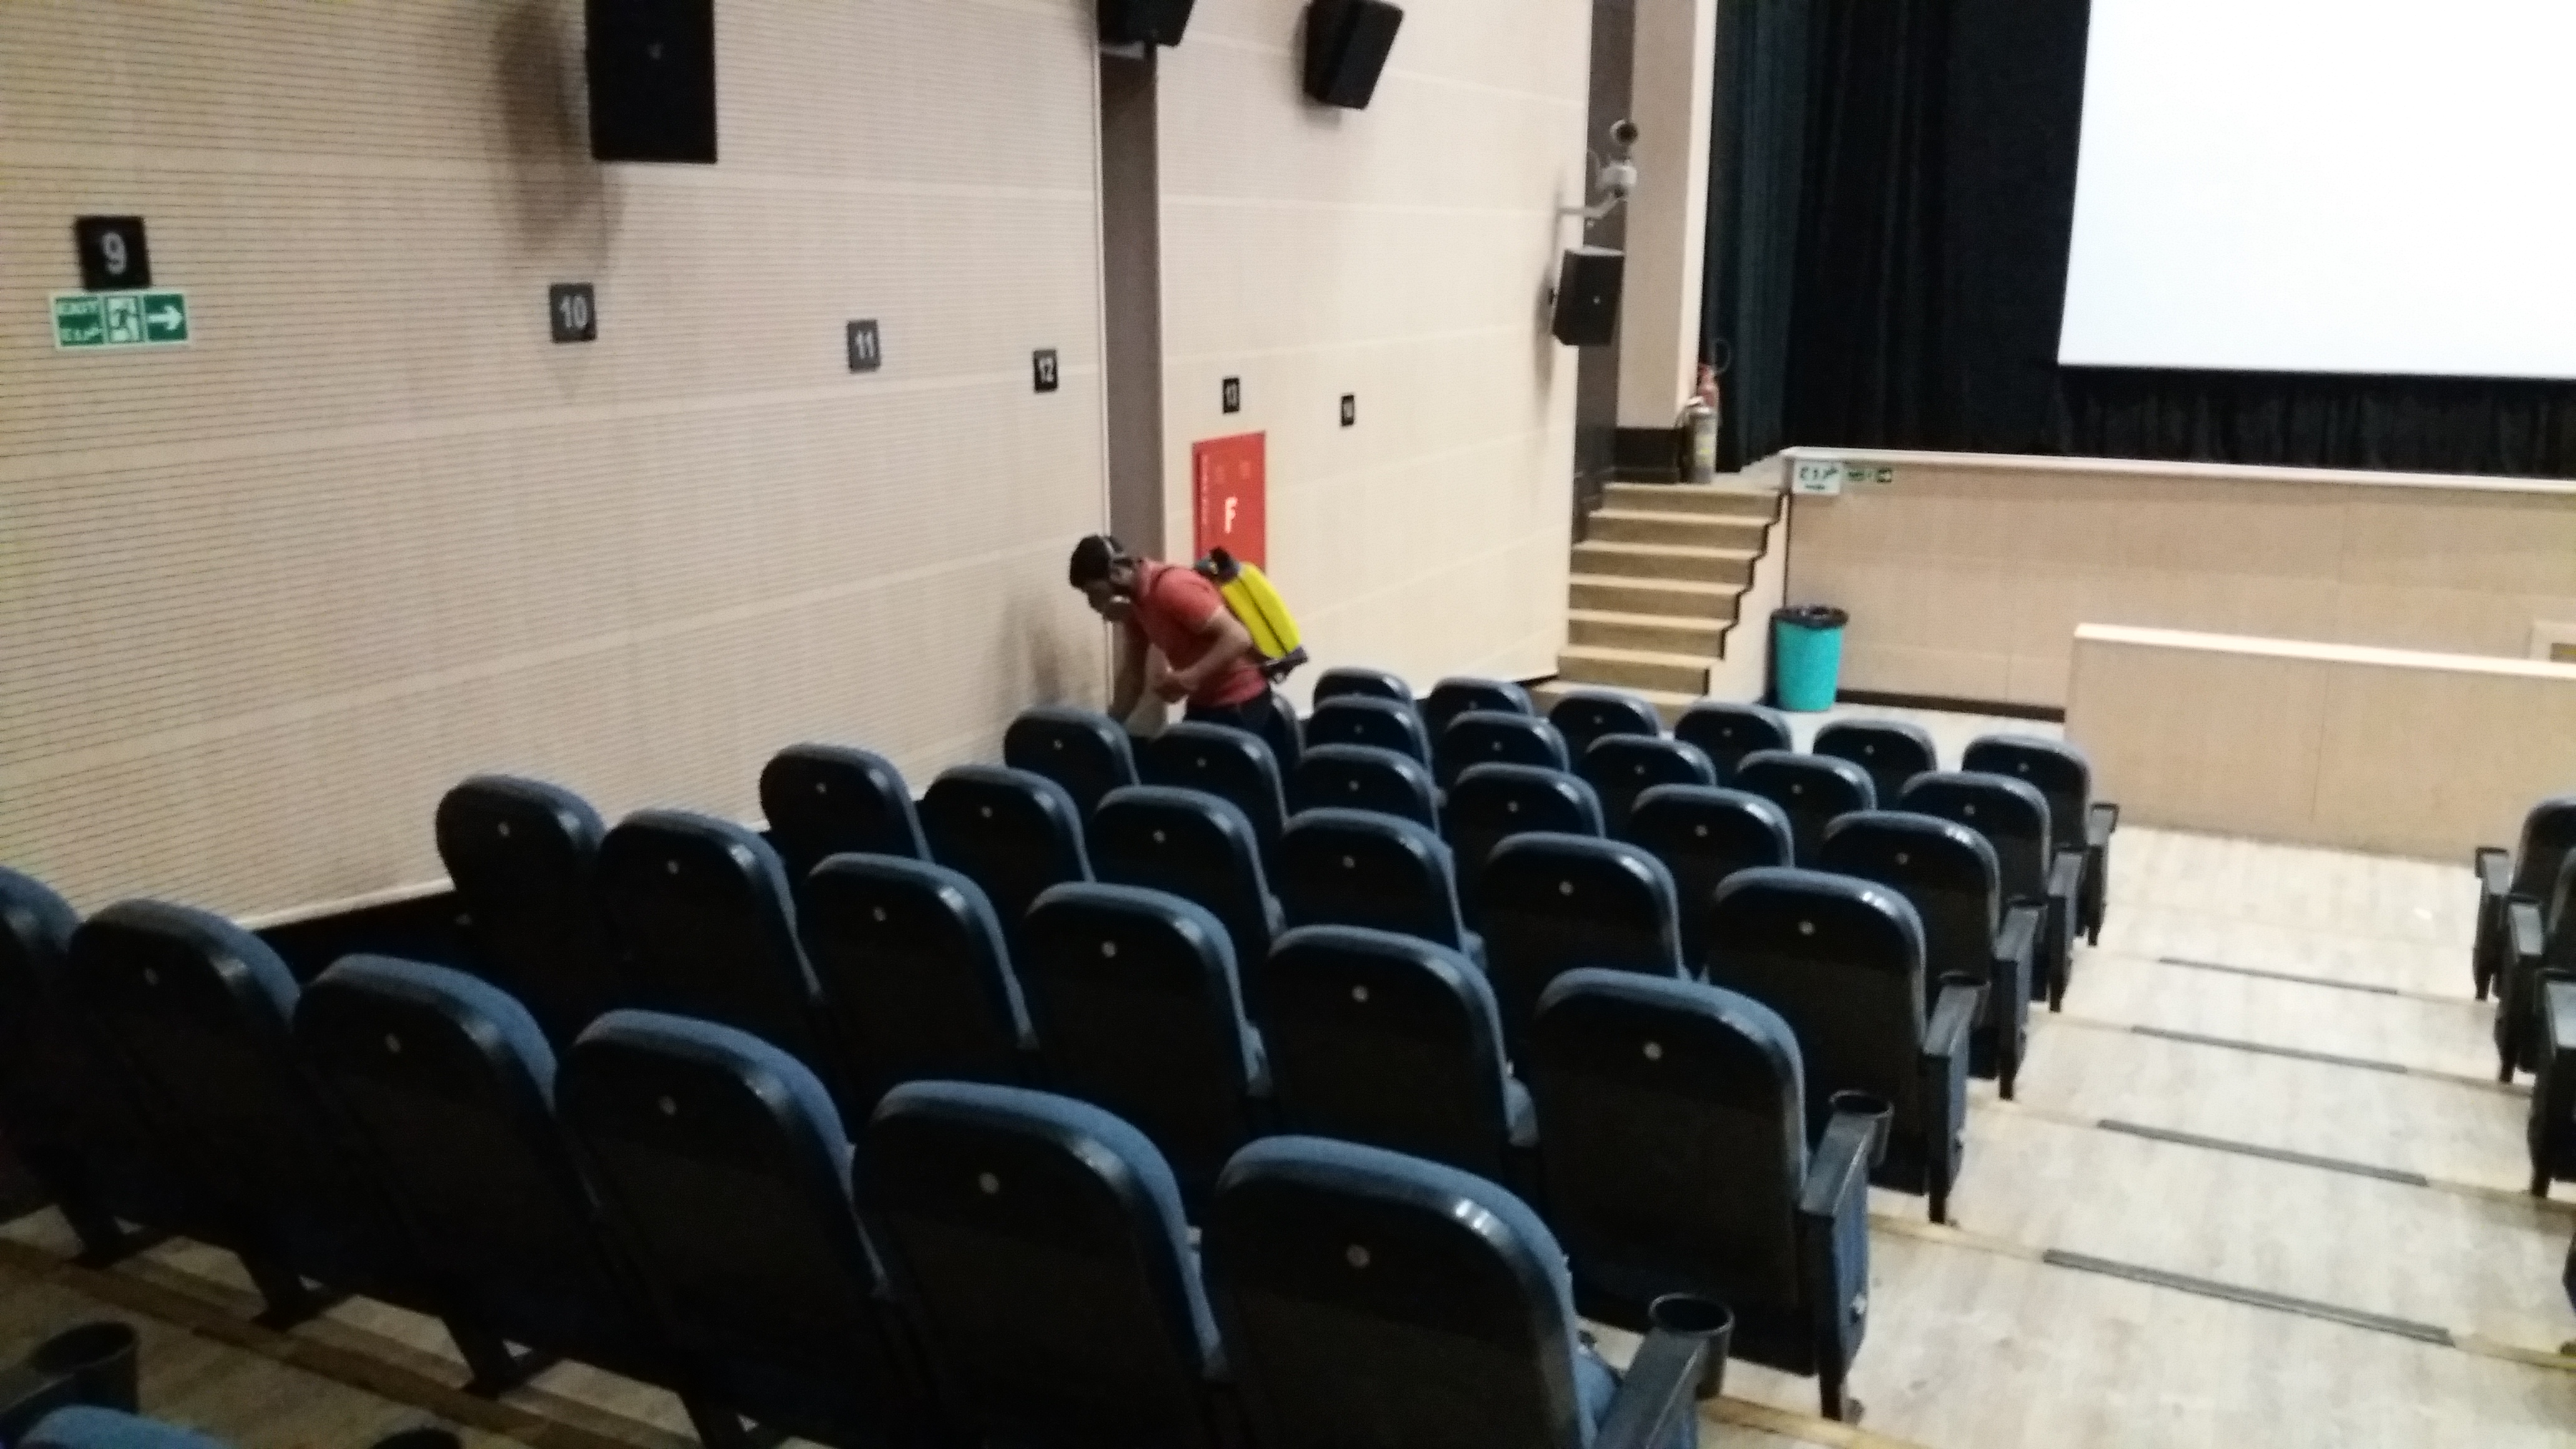 سمپاشی سینما در تهران،سمپاشی در تهران،سمپاشی منزل